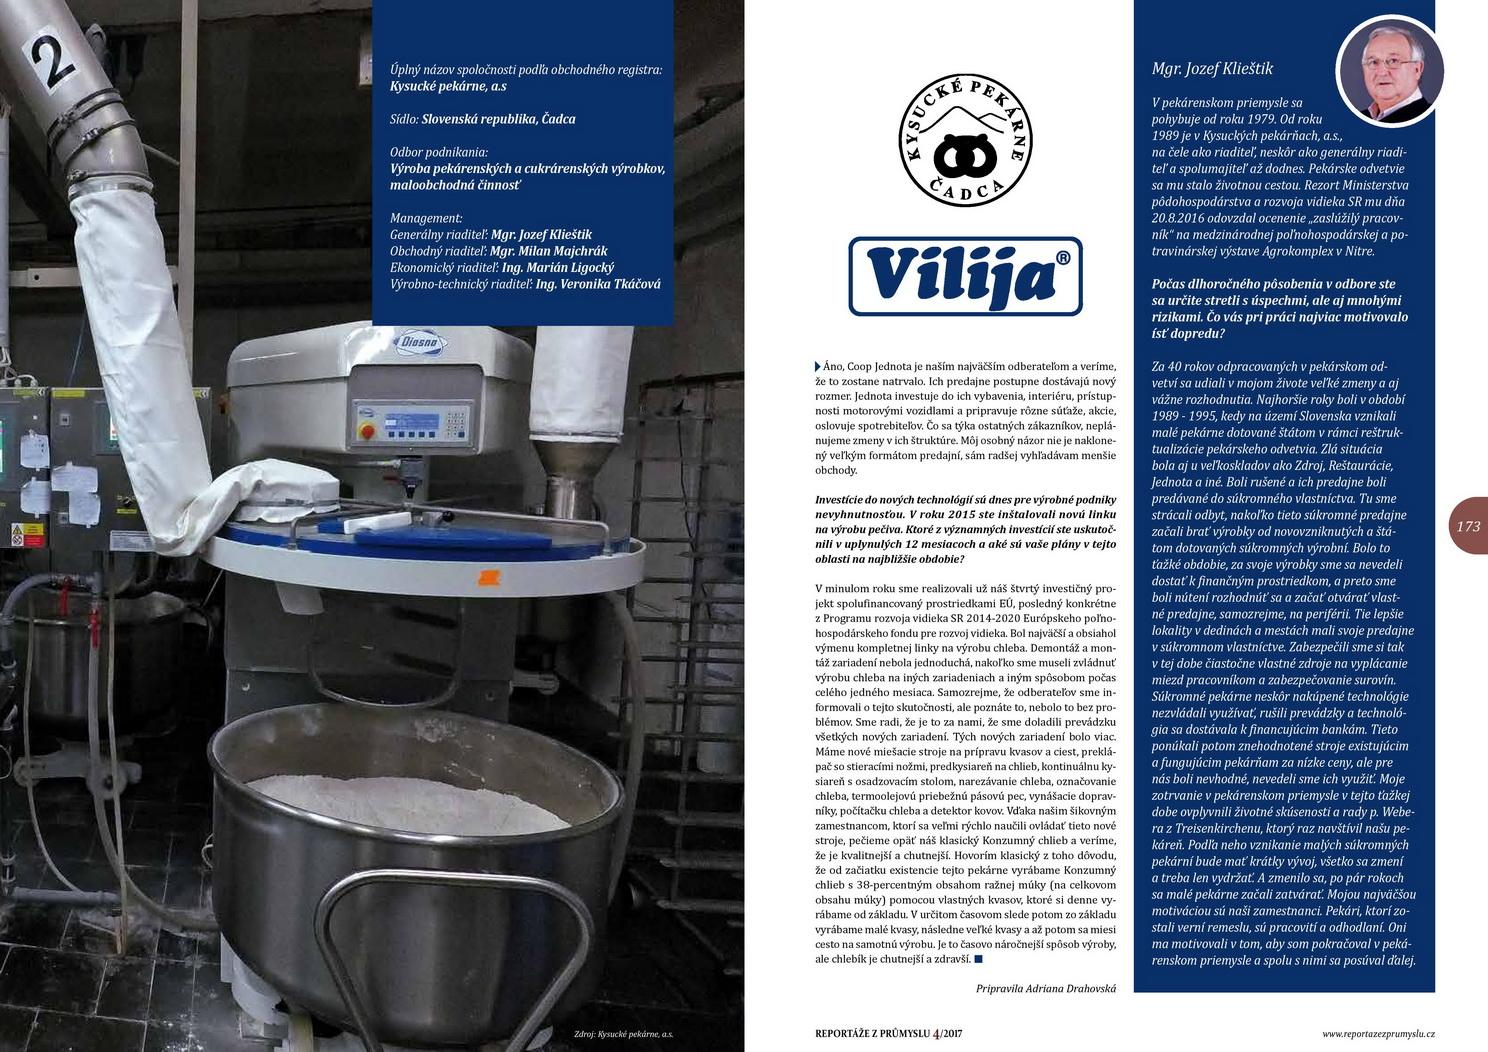 Časopis - český prúmysl - Vilija